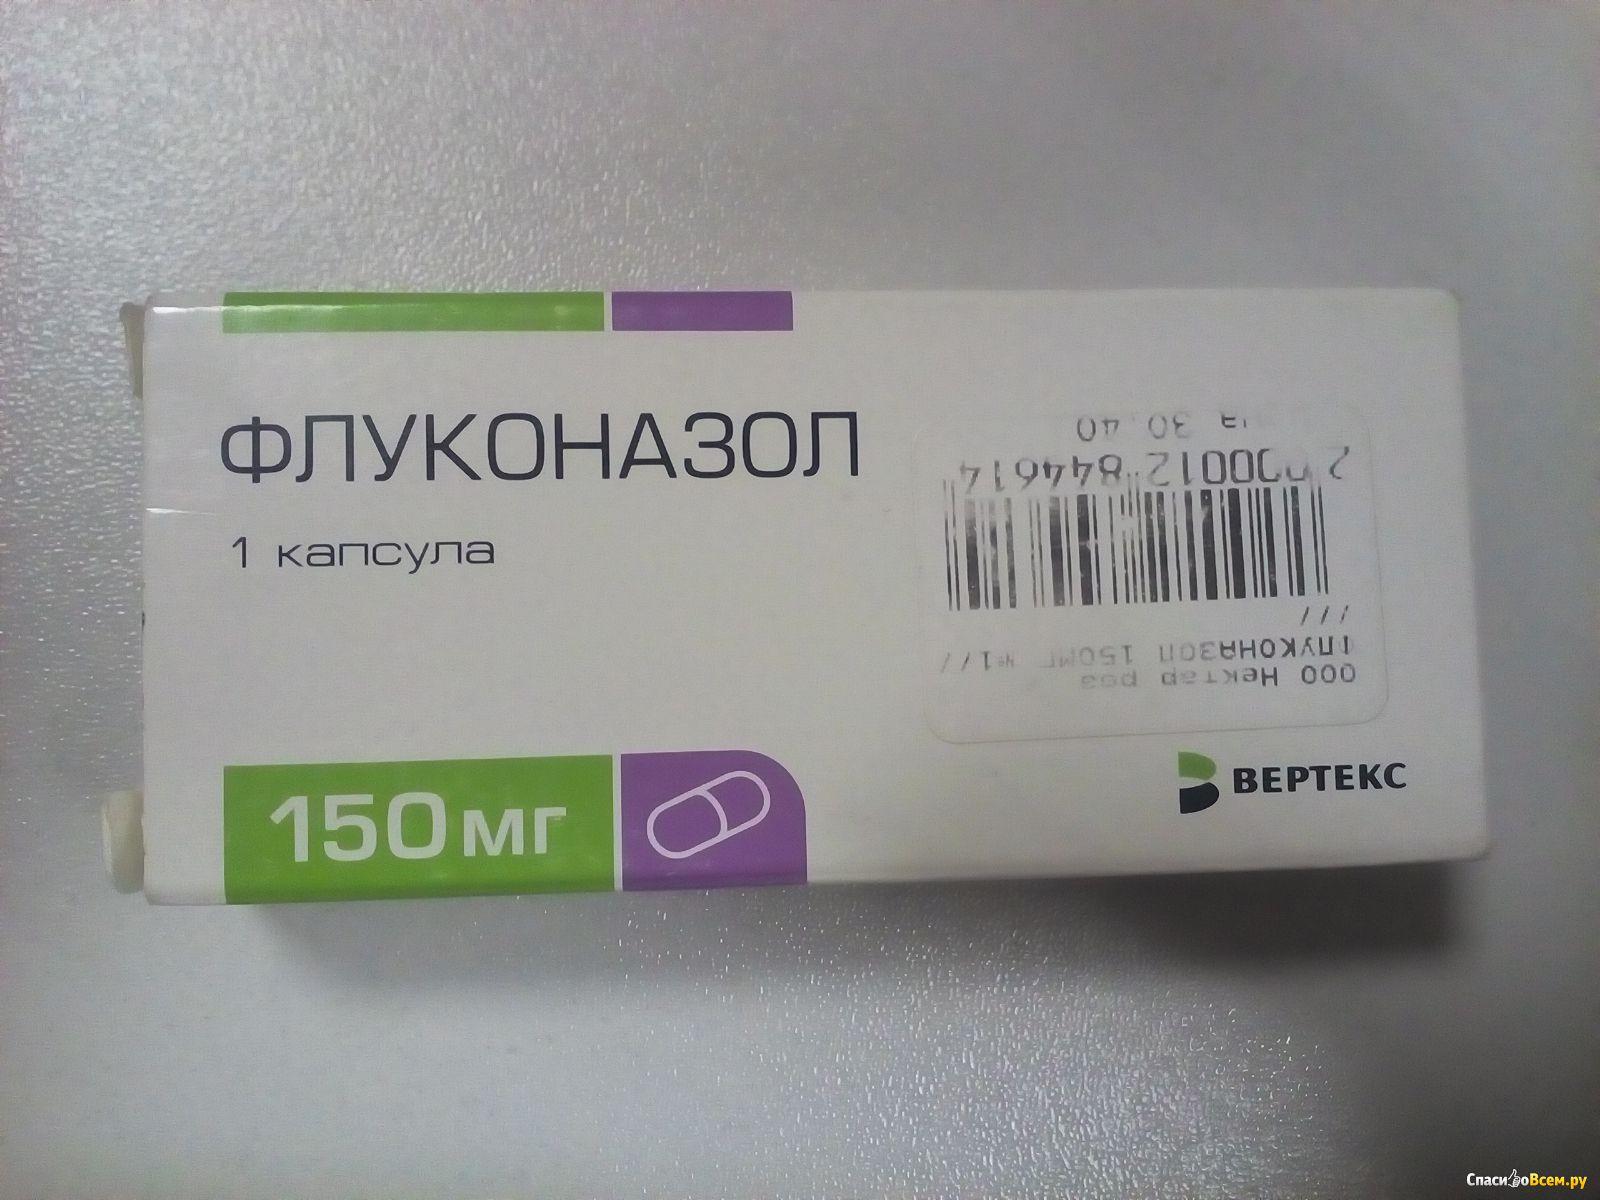 флуконазол не помог от молочницы